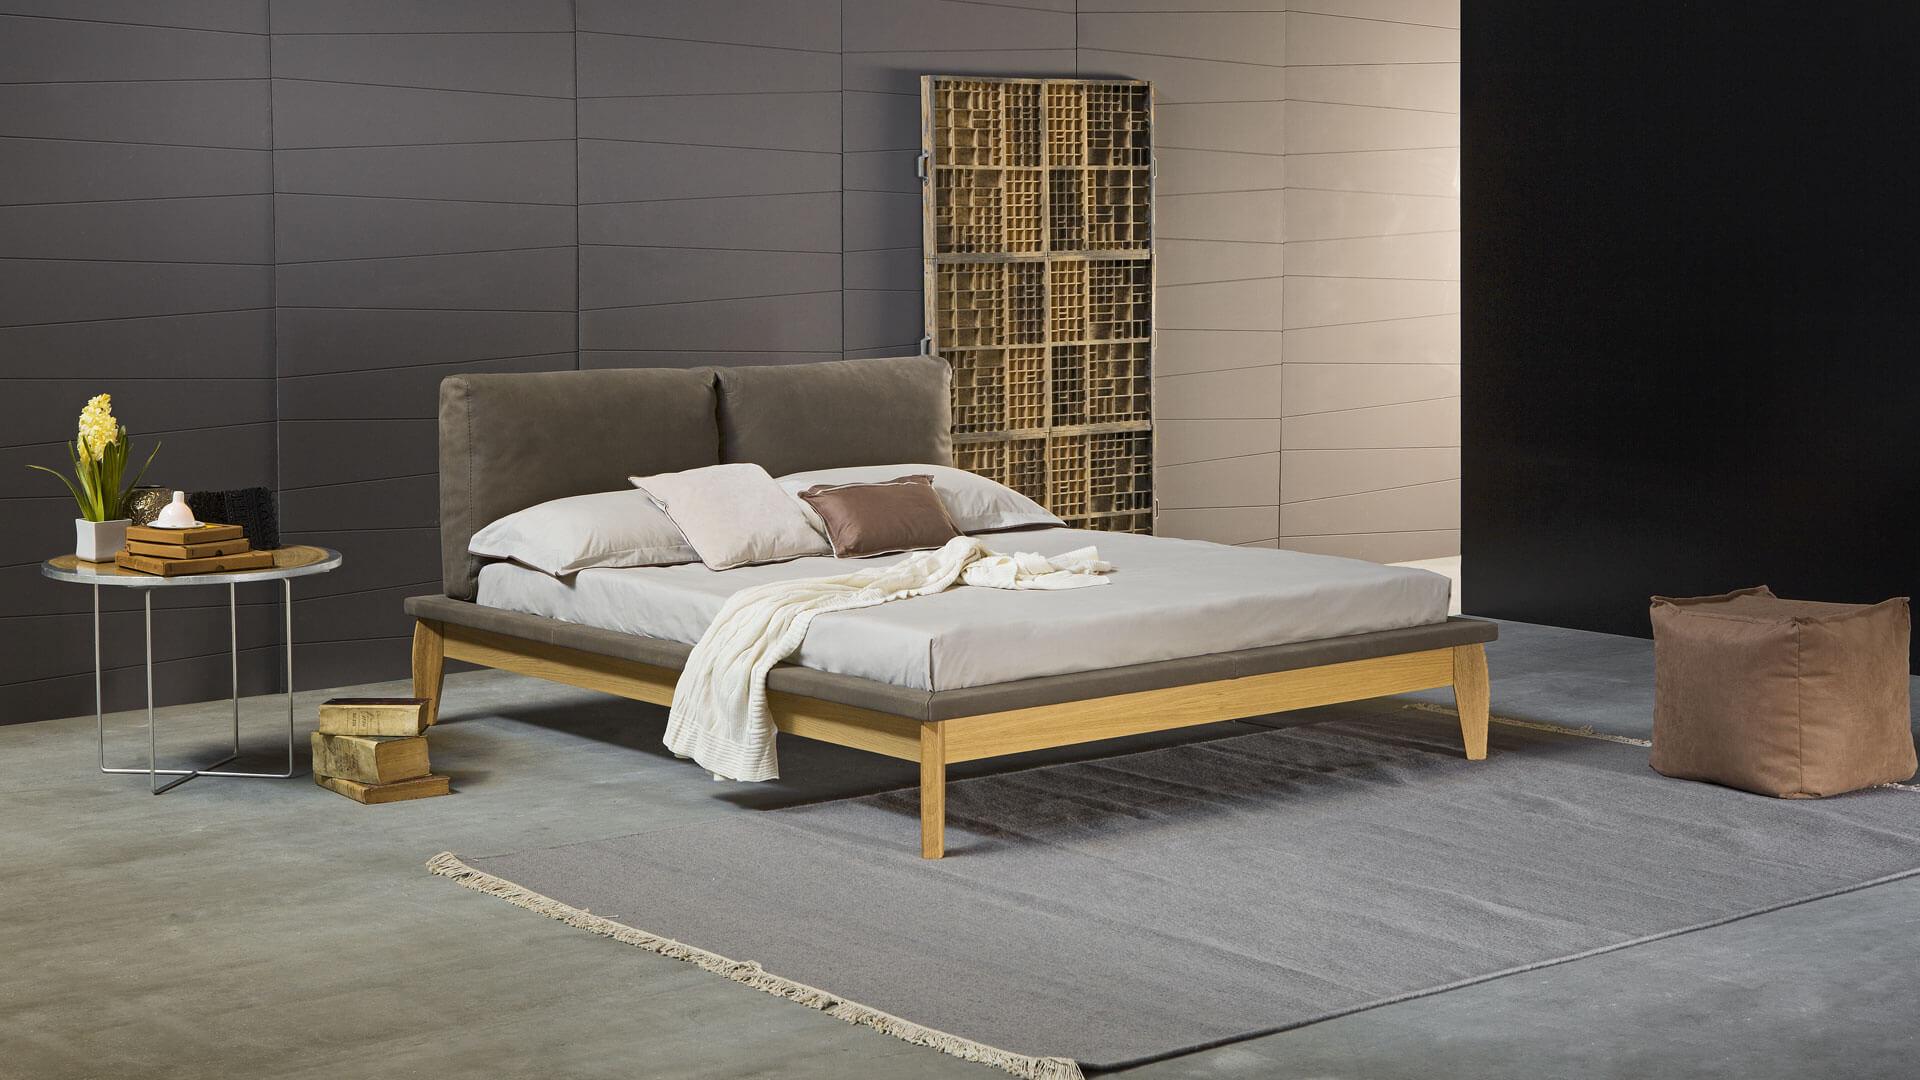 novaluna義大利床墊寢具